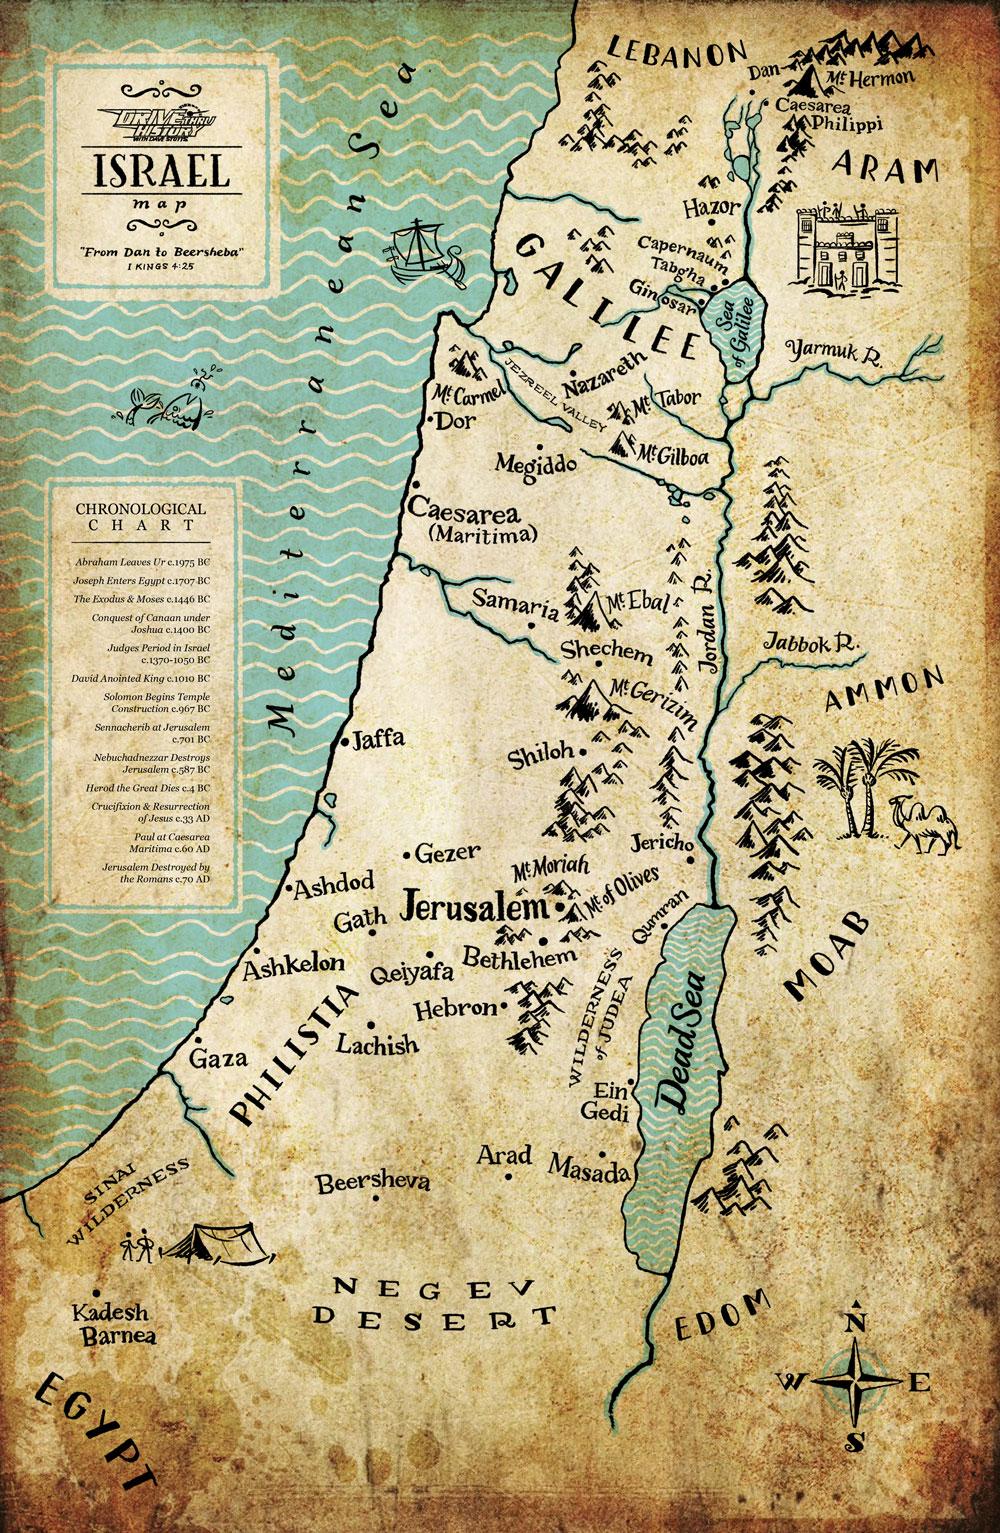 Israel_map_full_web.jpg